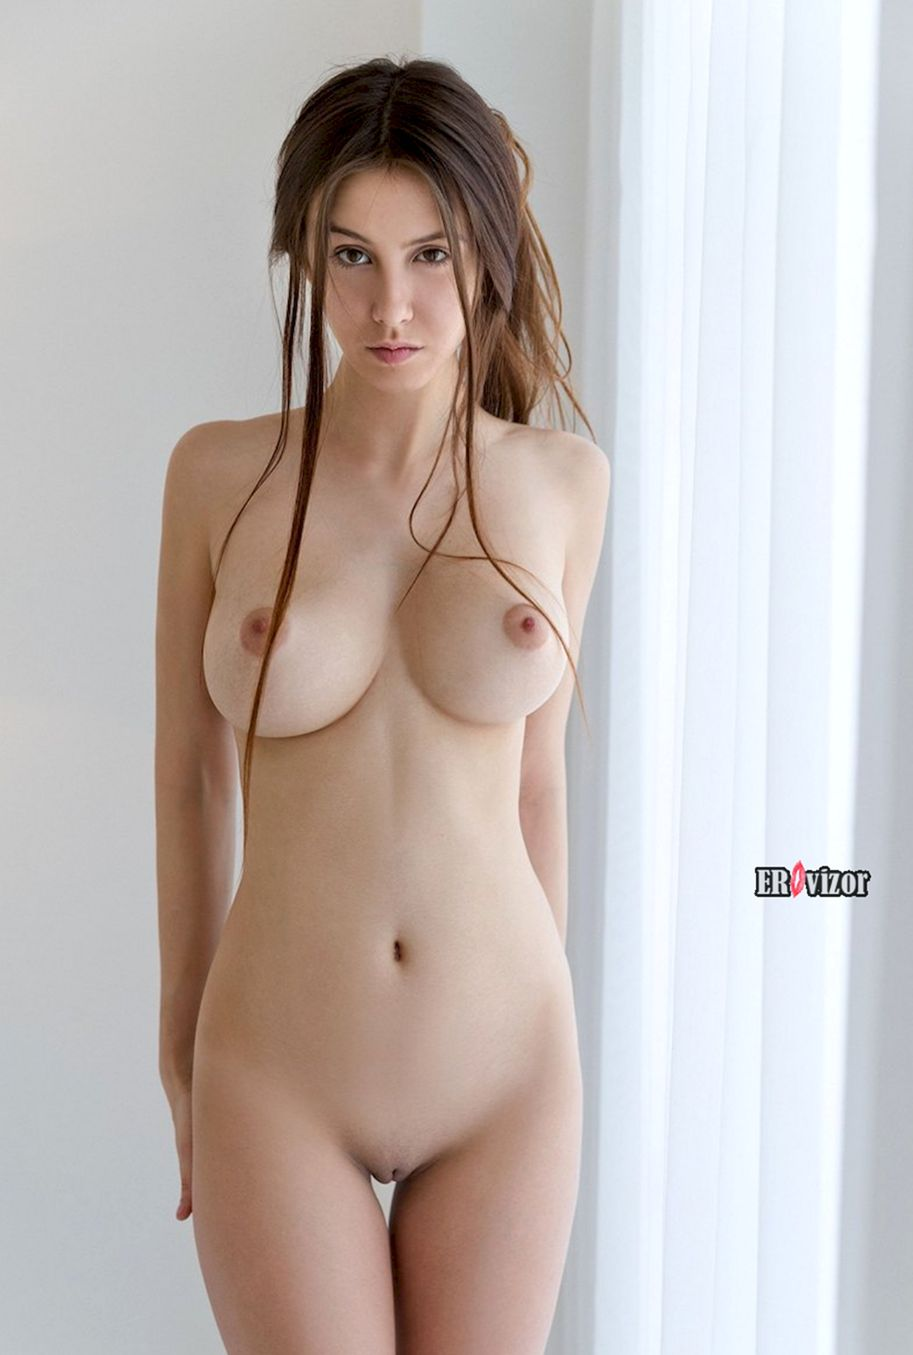 Busty-Brunette-Jessica(3)